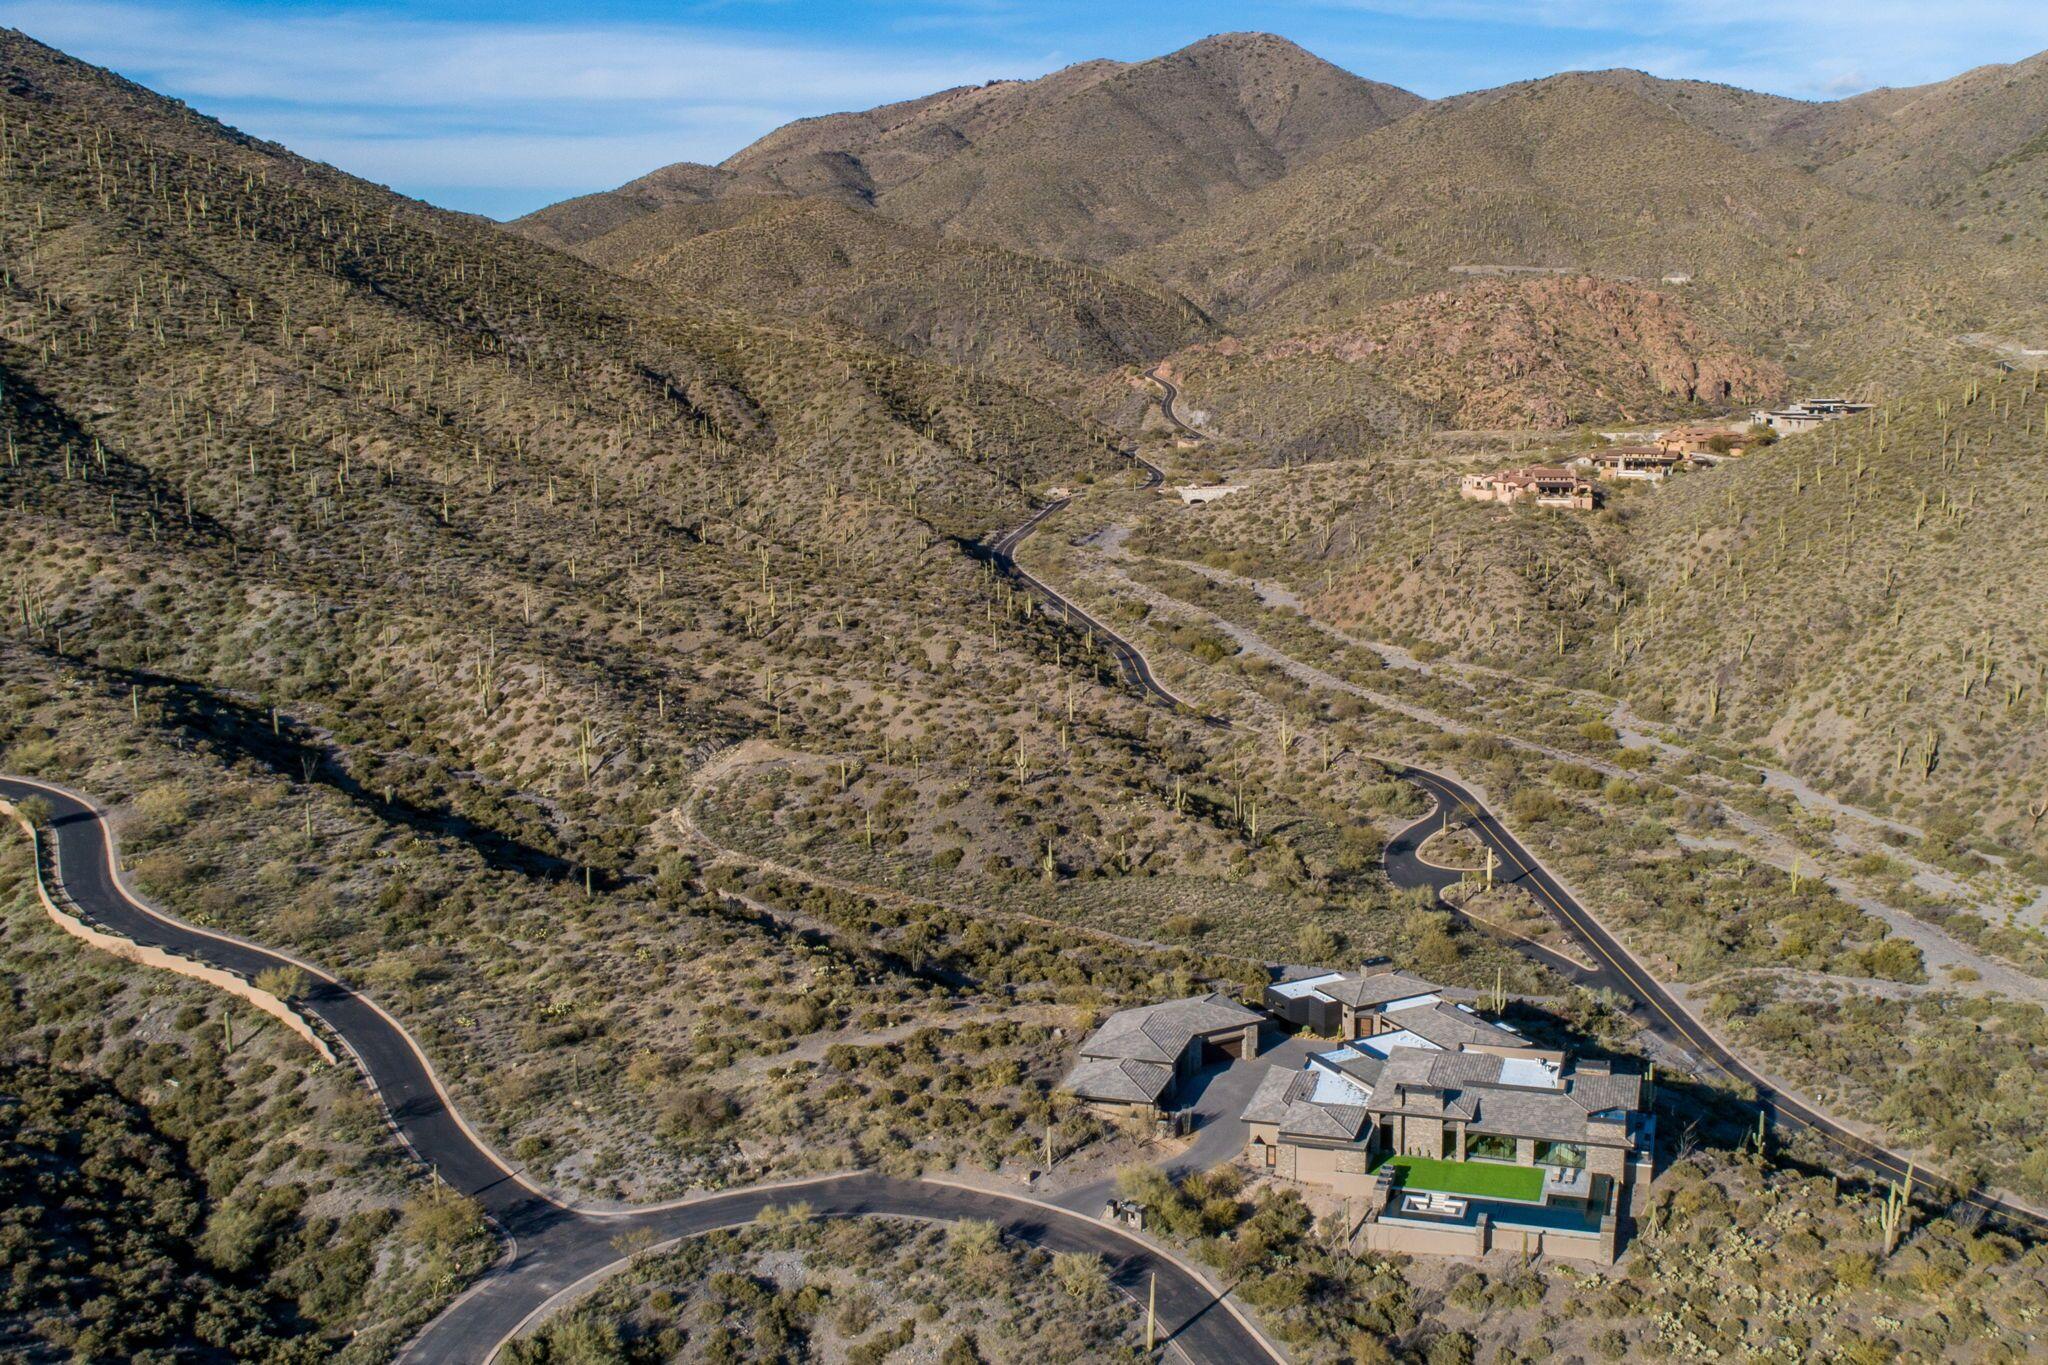 9300+E+Grapevine+Pass+Scottsdale-1-WebQuality-Beautiful+Desert+Mountain.jpg